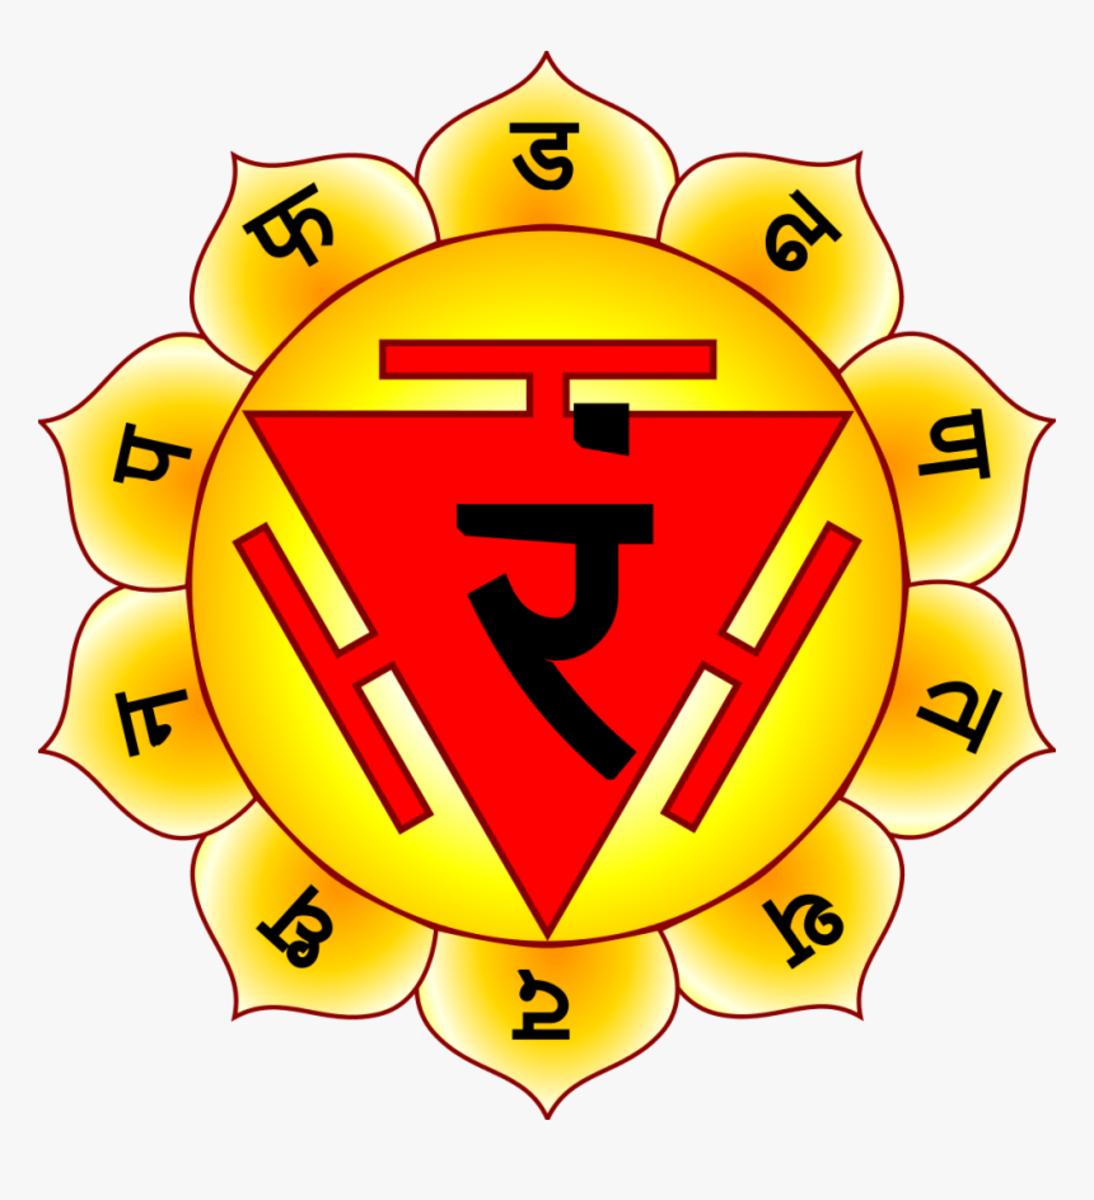 Manipura chakra (Solar Plexus Chakra)